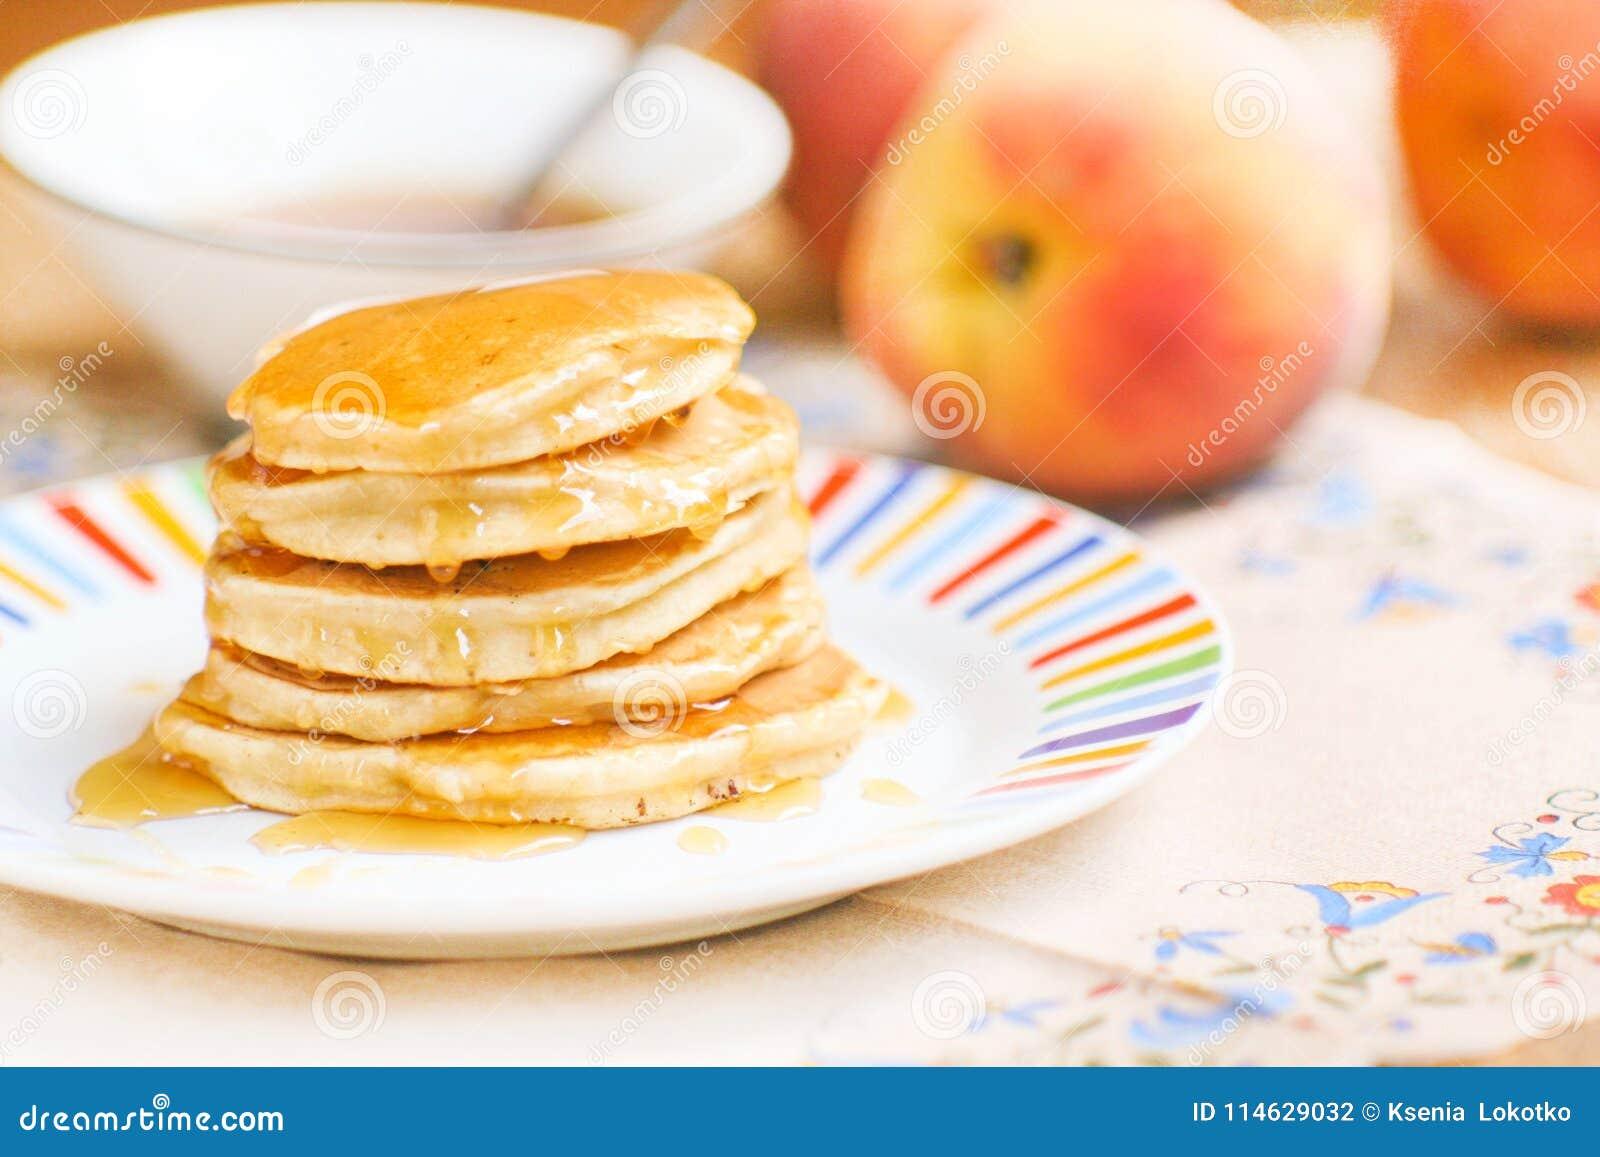 Homemade sweet pancakes with honey